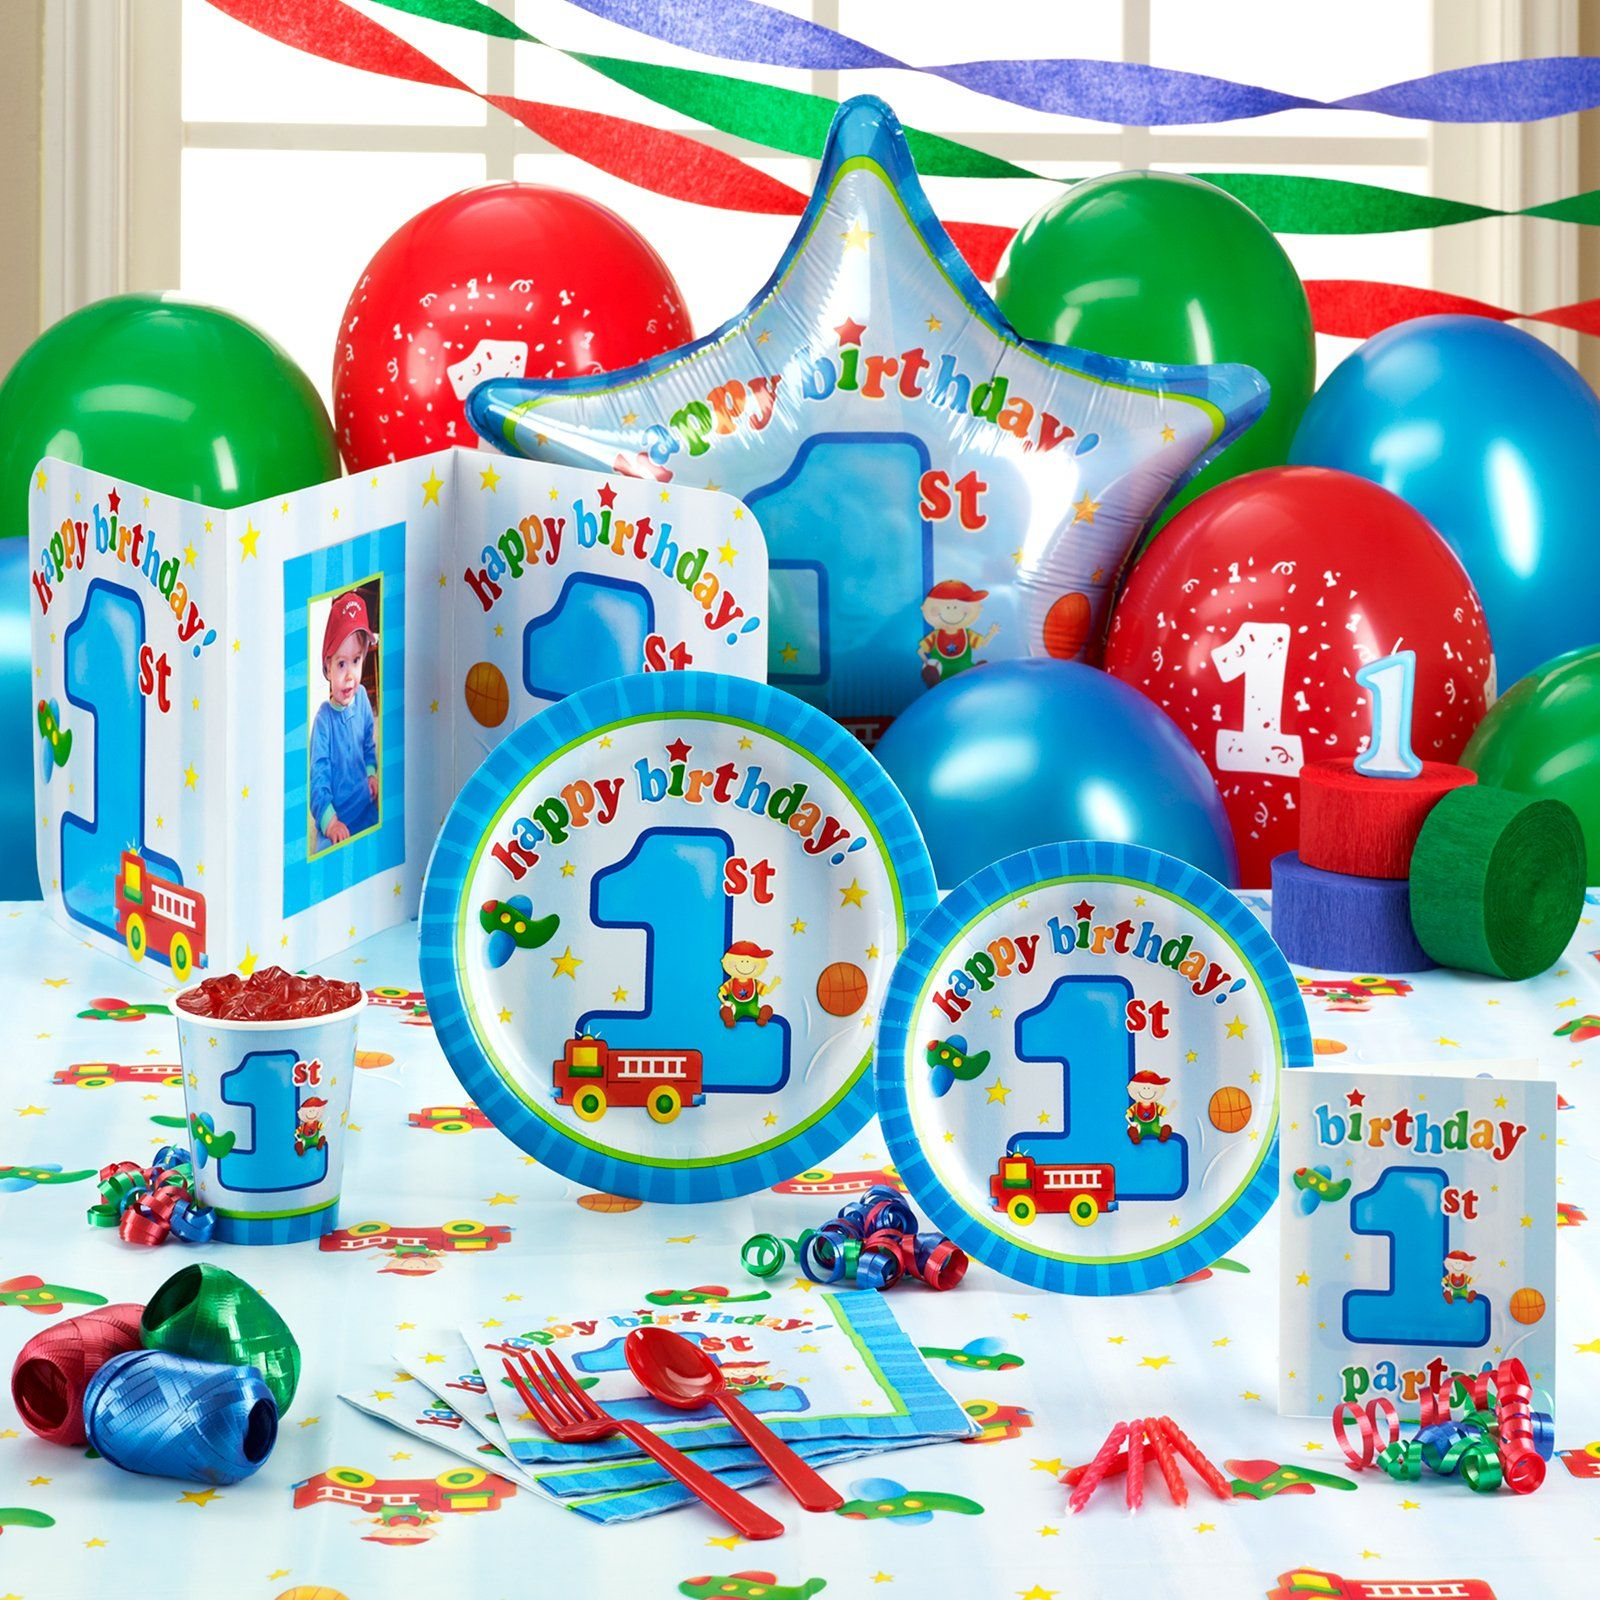 cb4b2f858d1 Boys Playtime 1st Birthday Party Supplies